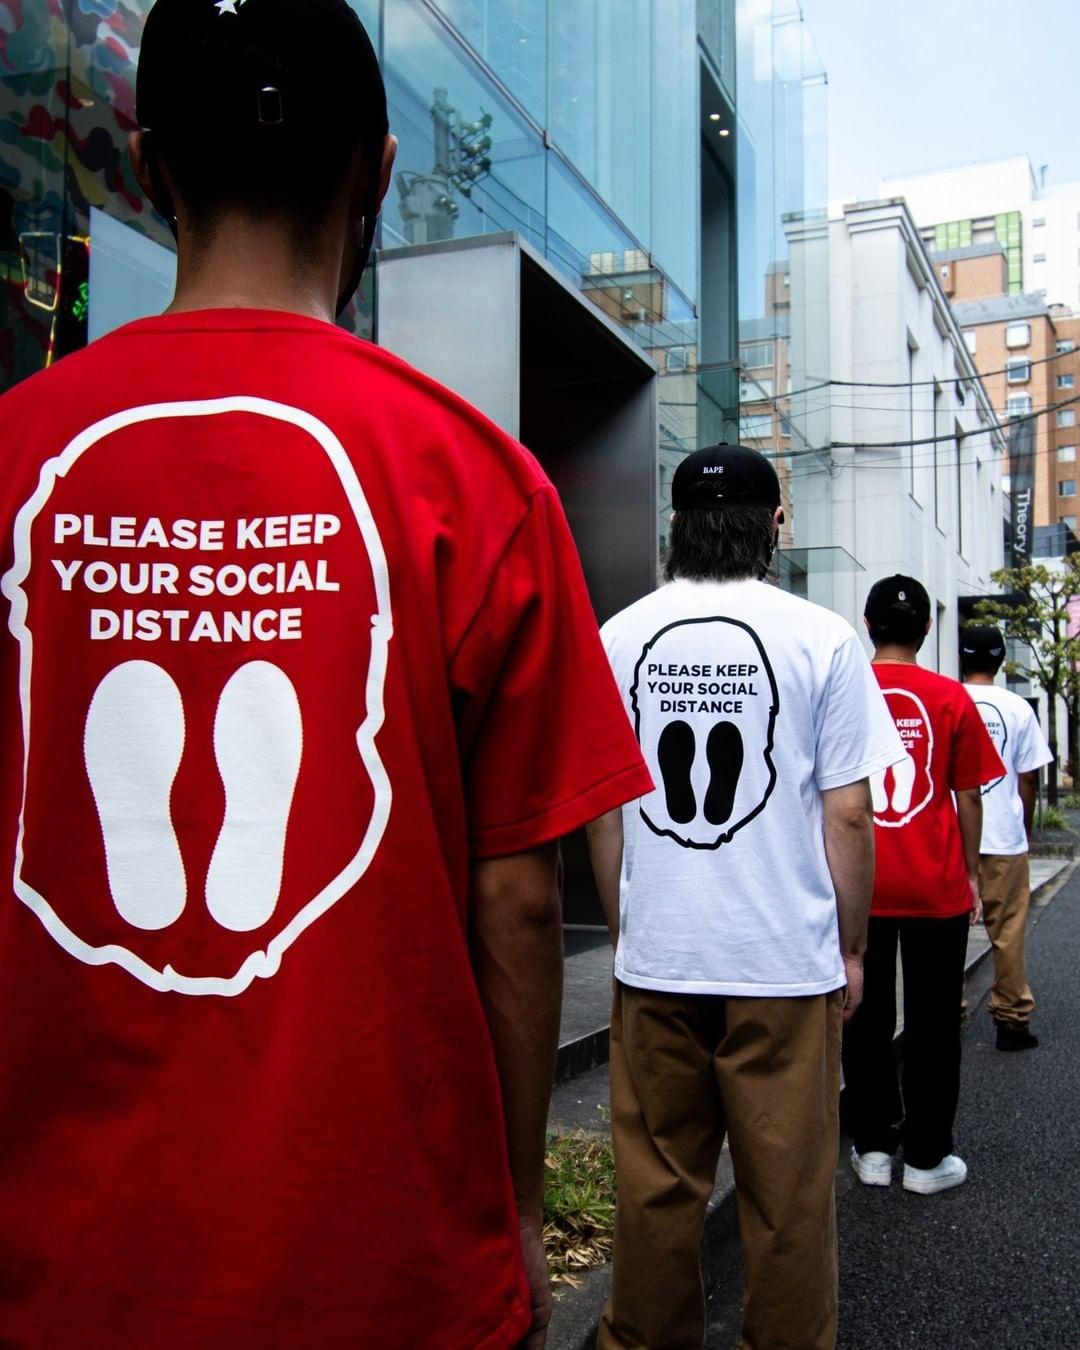 BAPE social distance